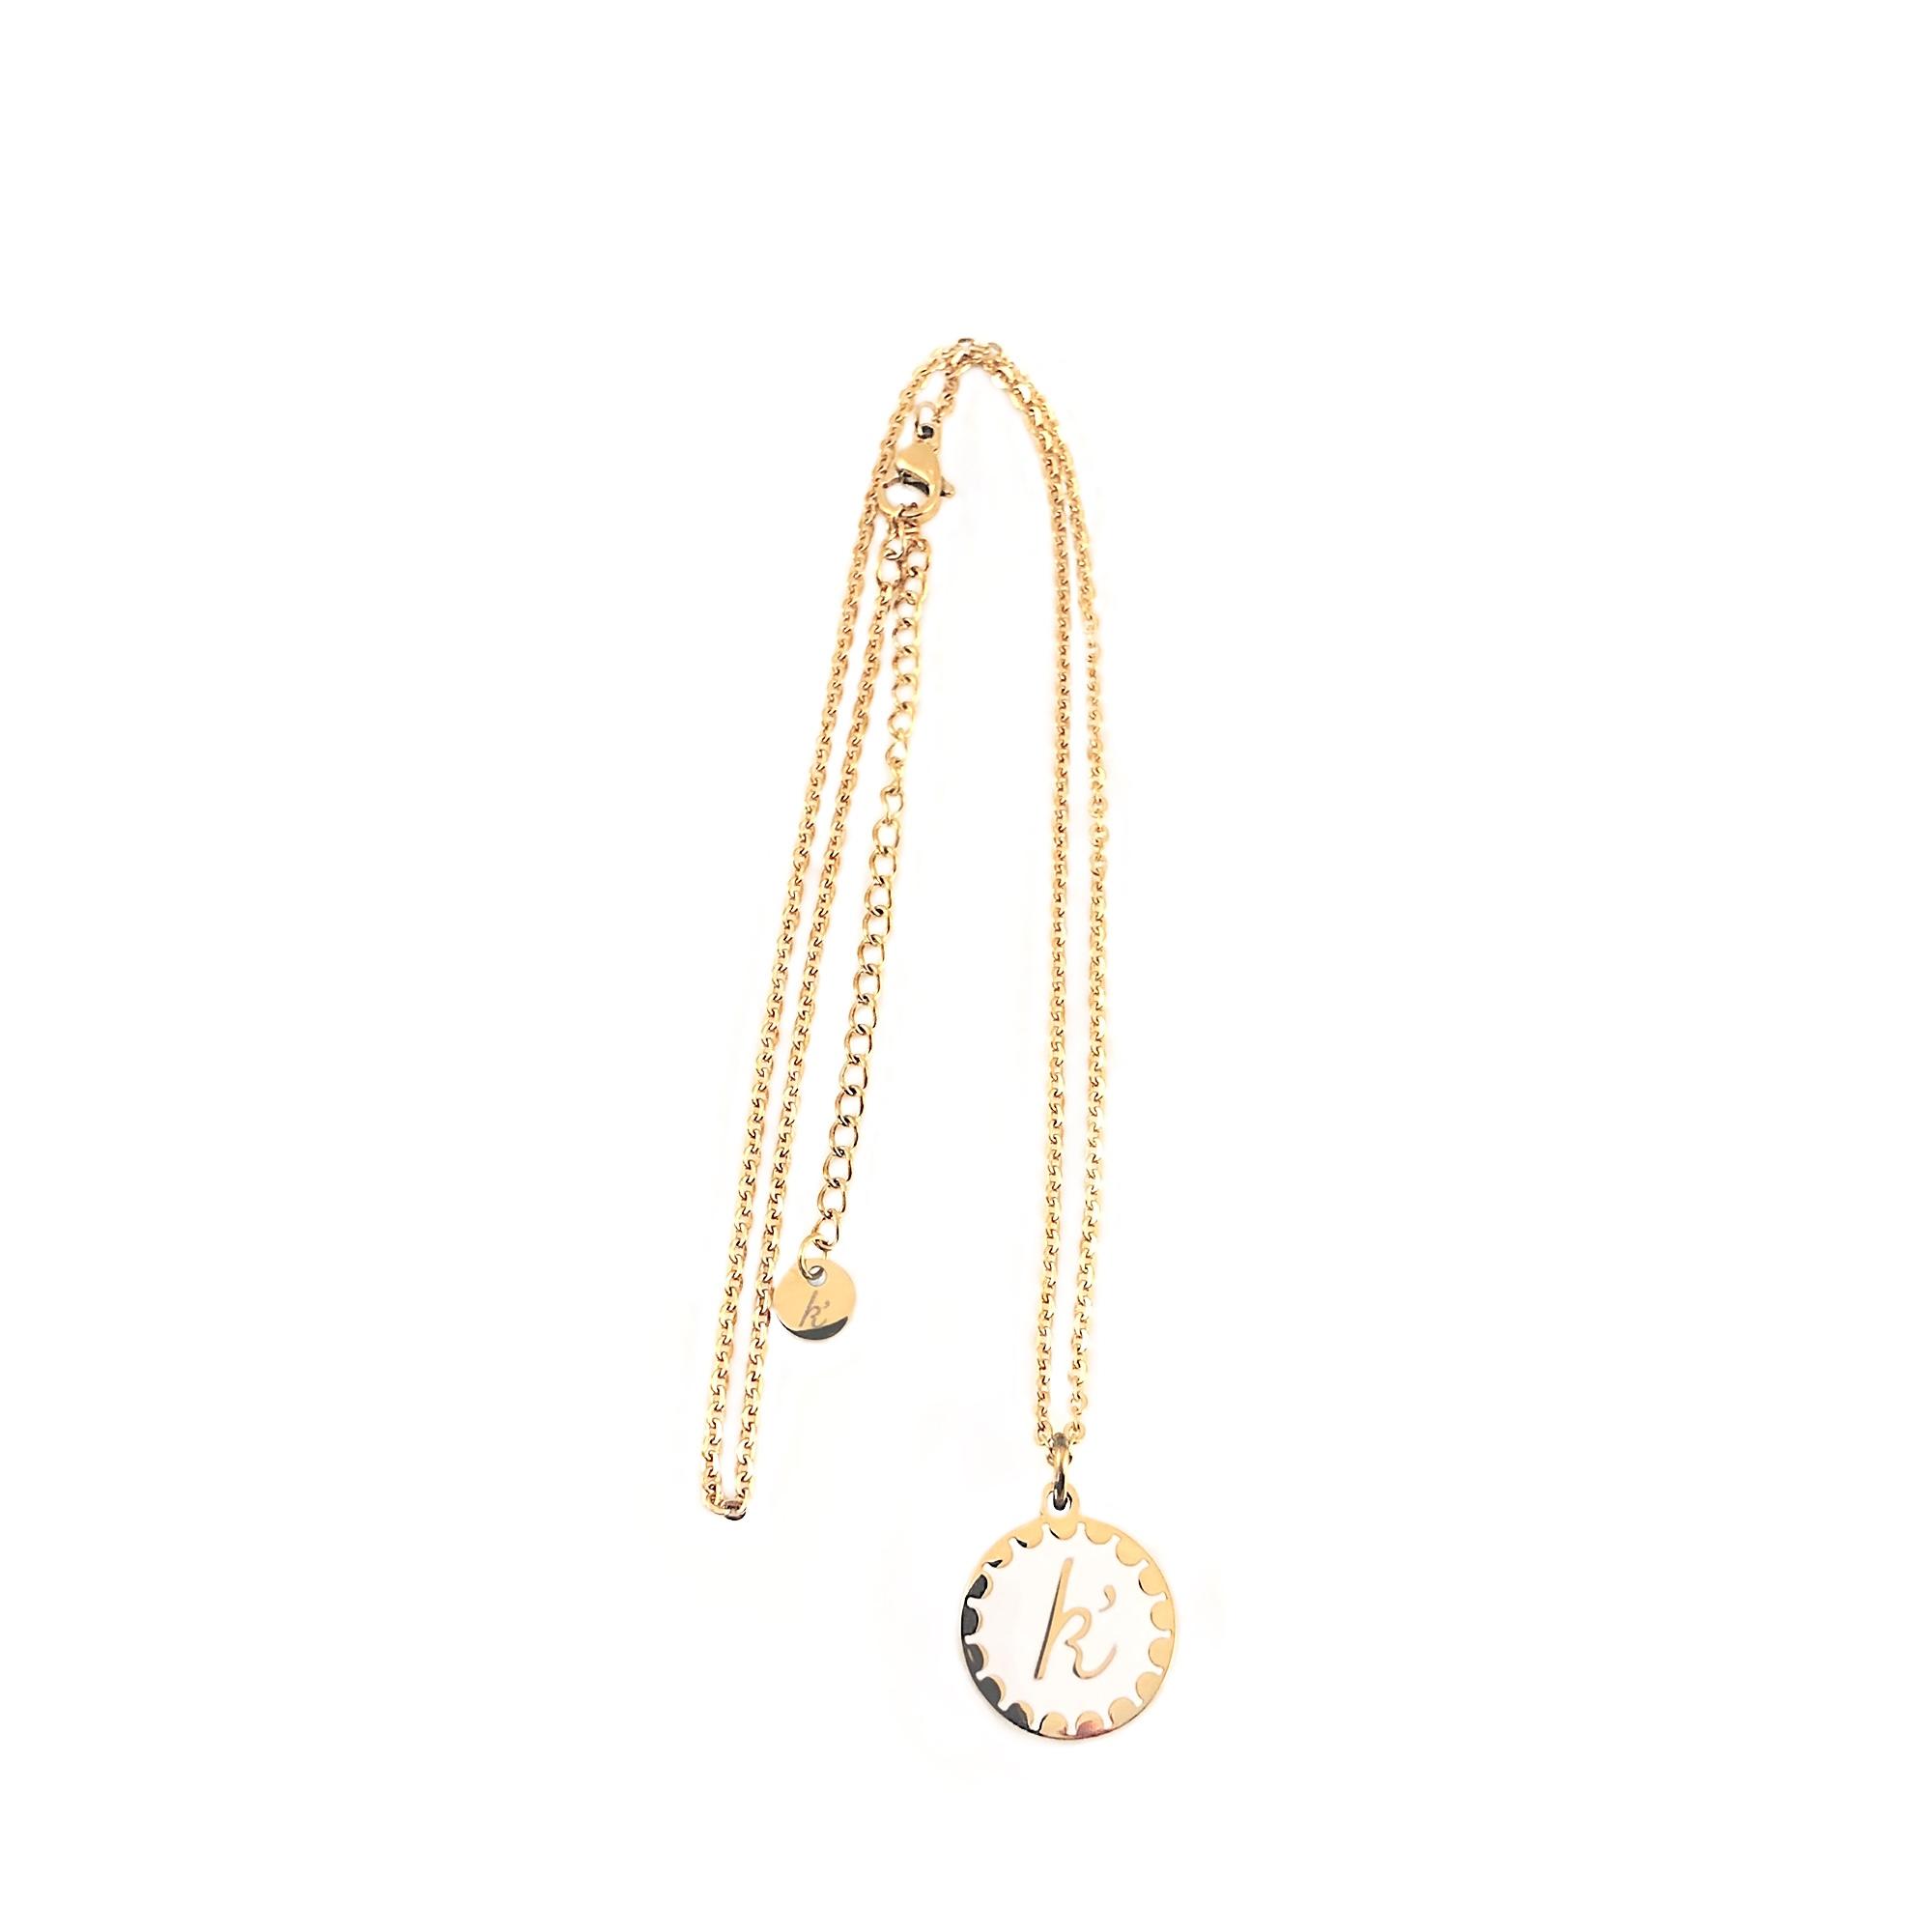 Edelstaal jasseron ketting met sierlijke platte bedel goud